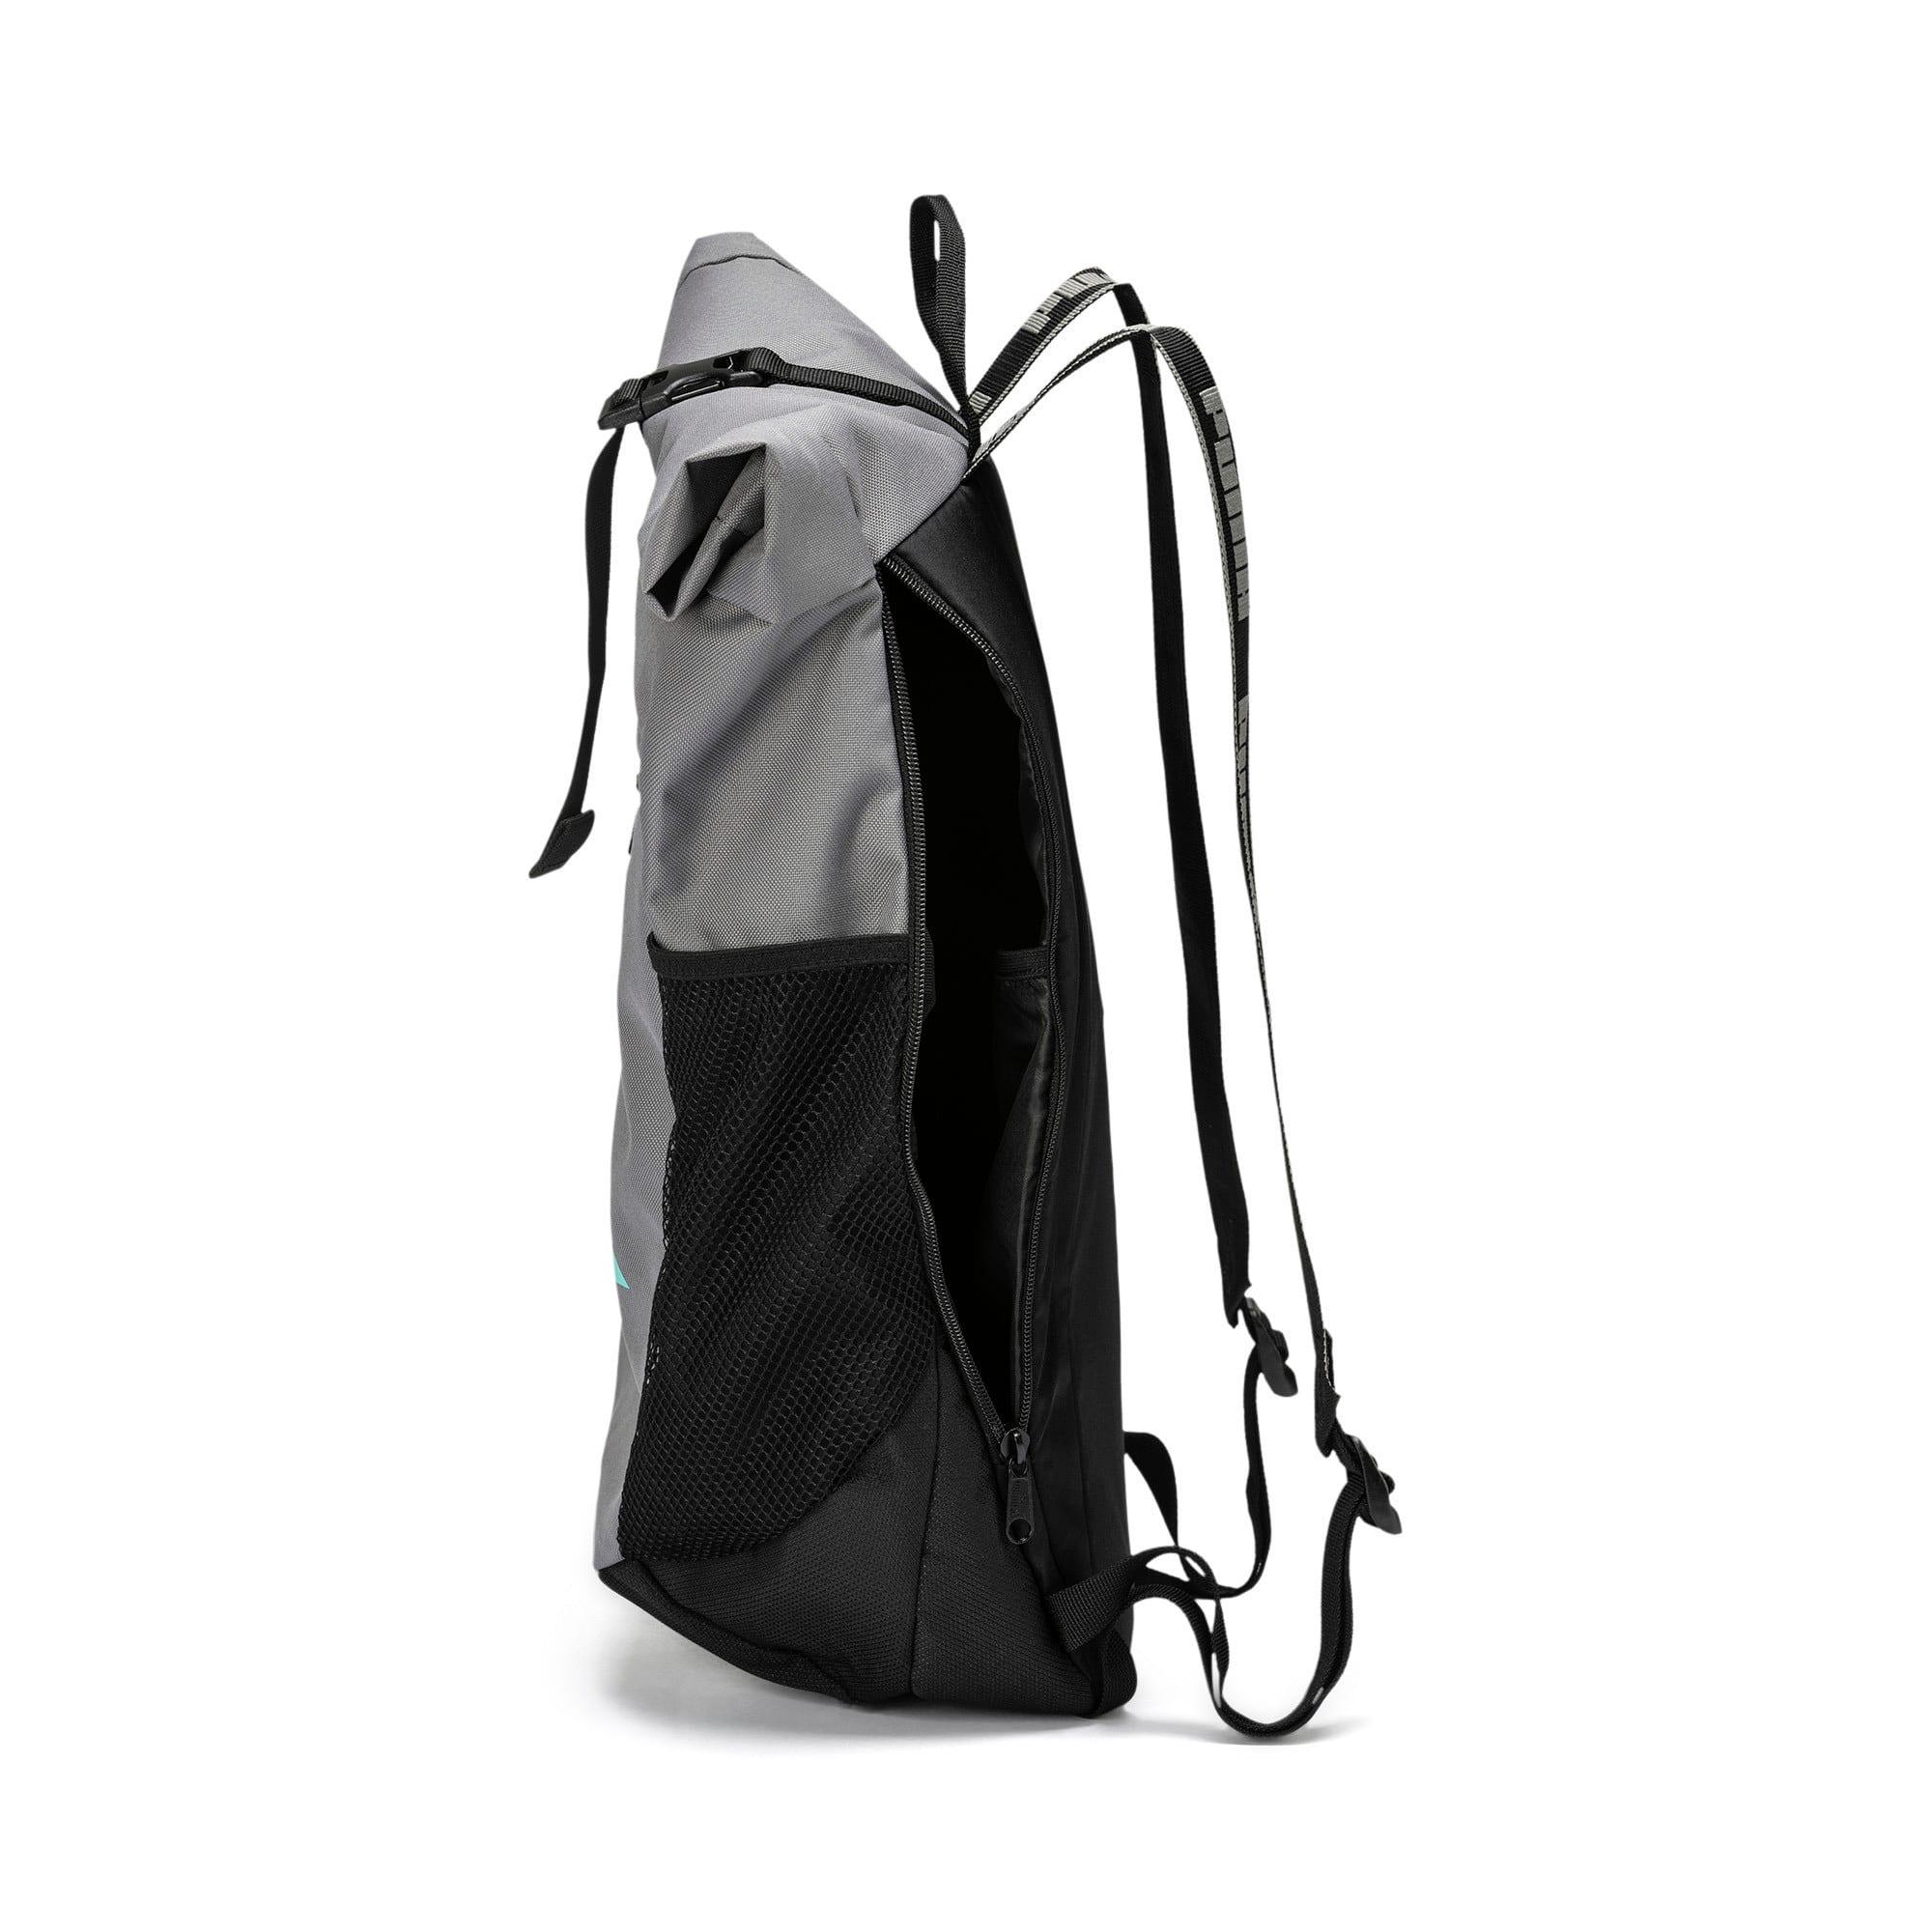 Thumbnail 3 of Sole Backpack, CASTLEROCK, medium